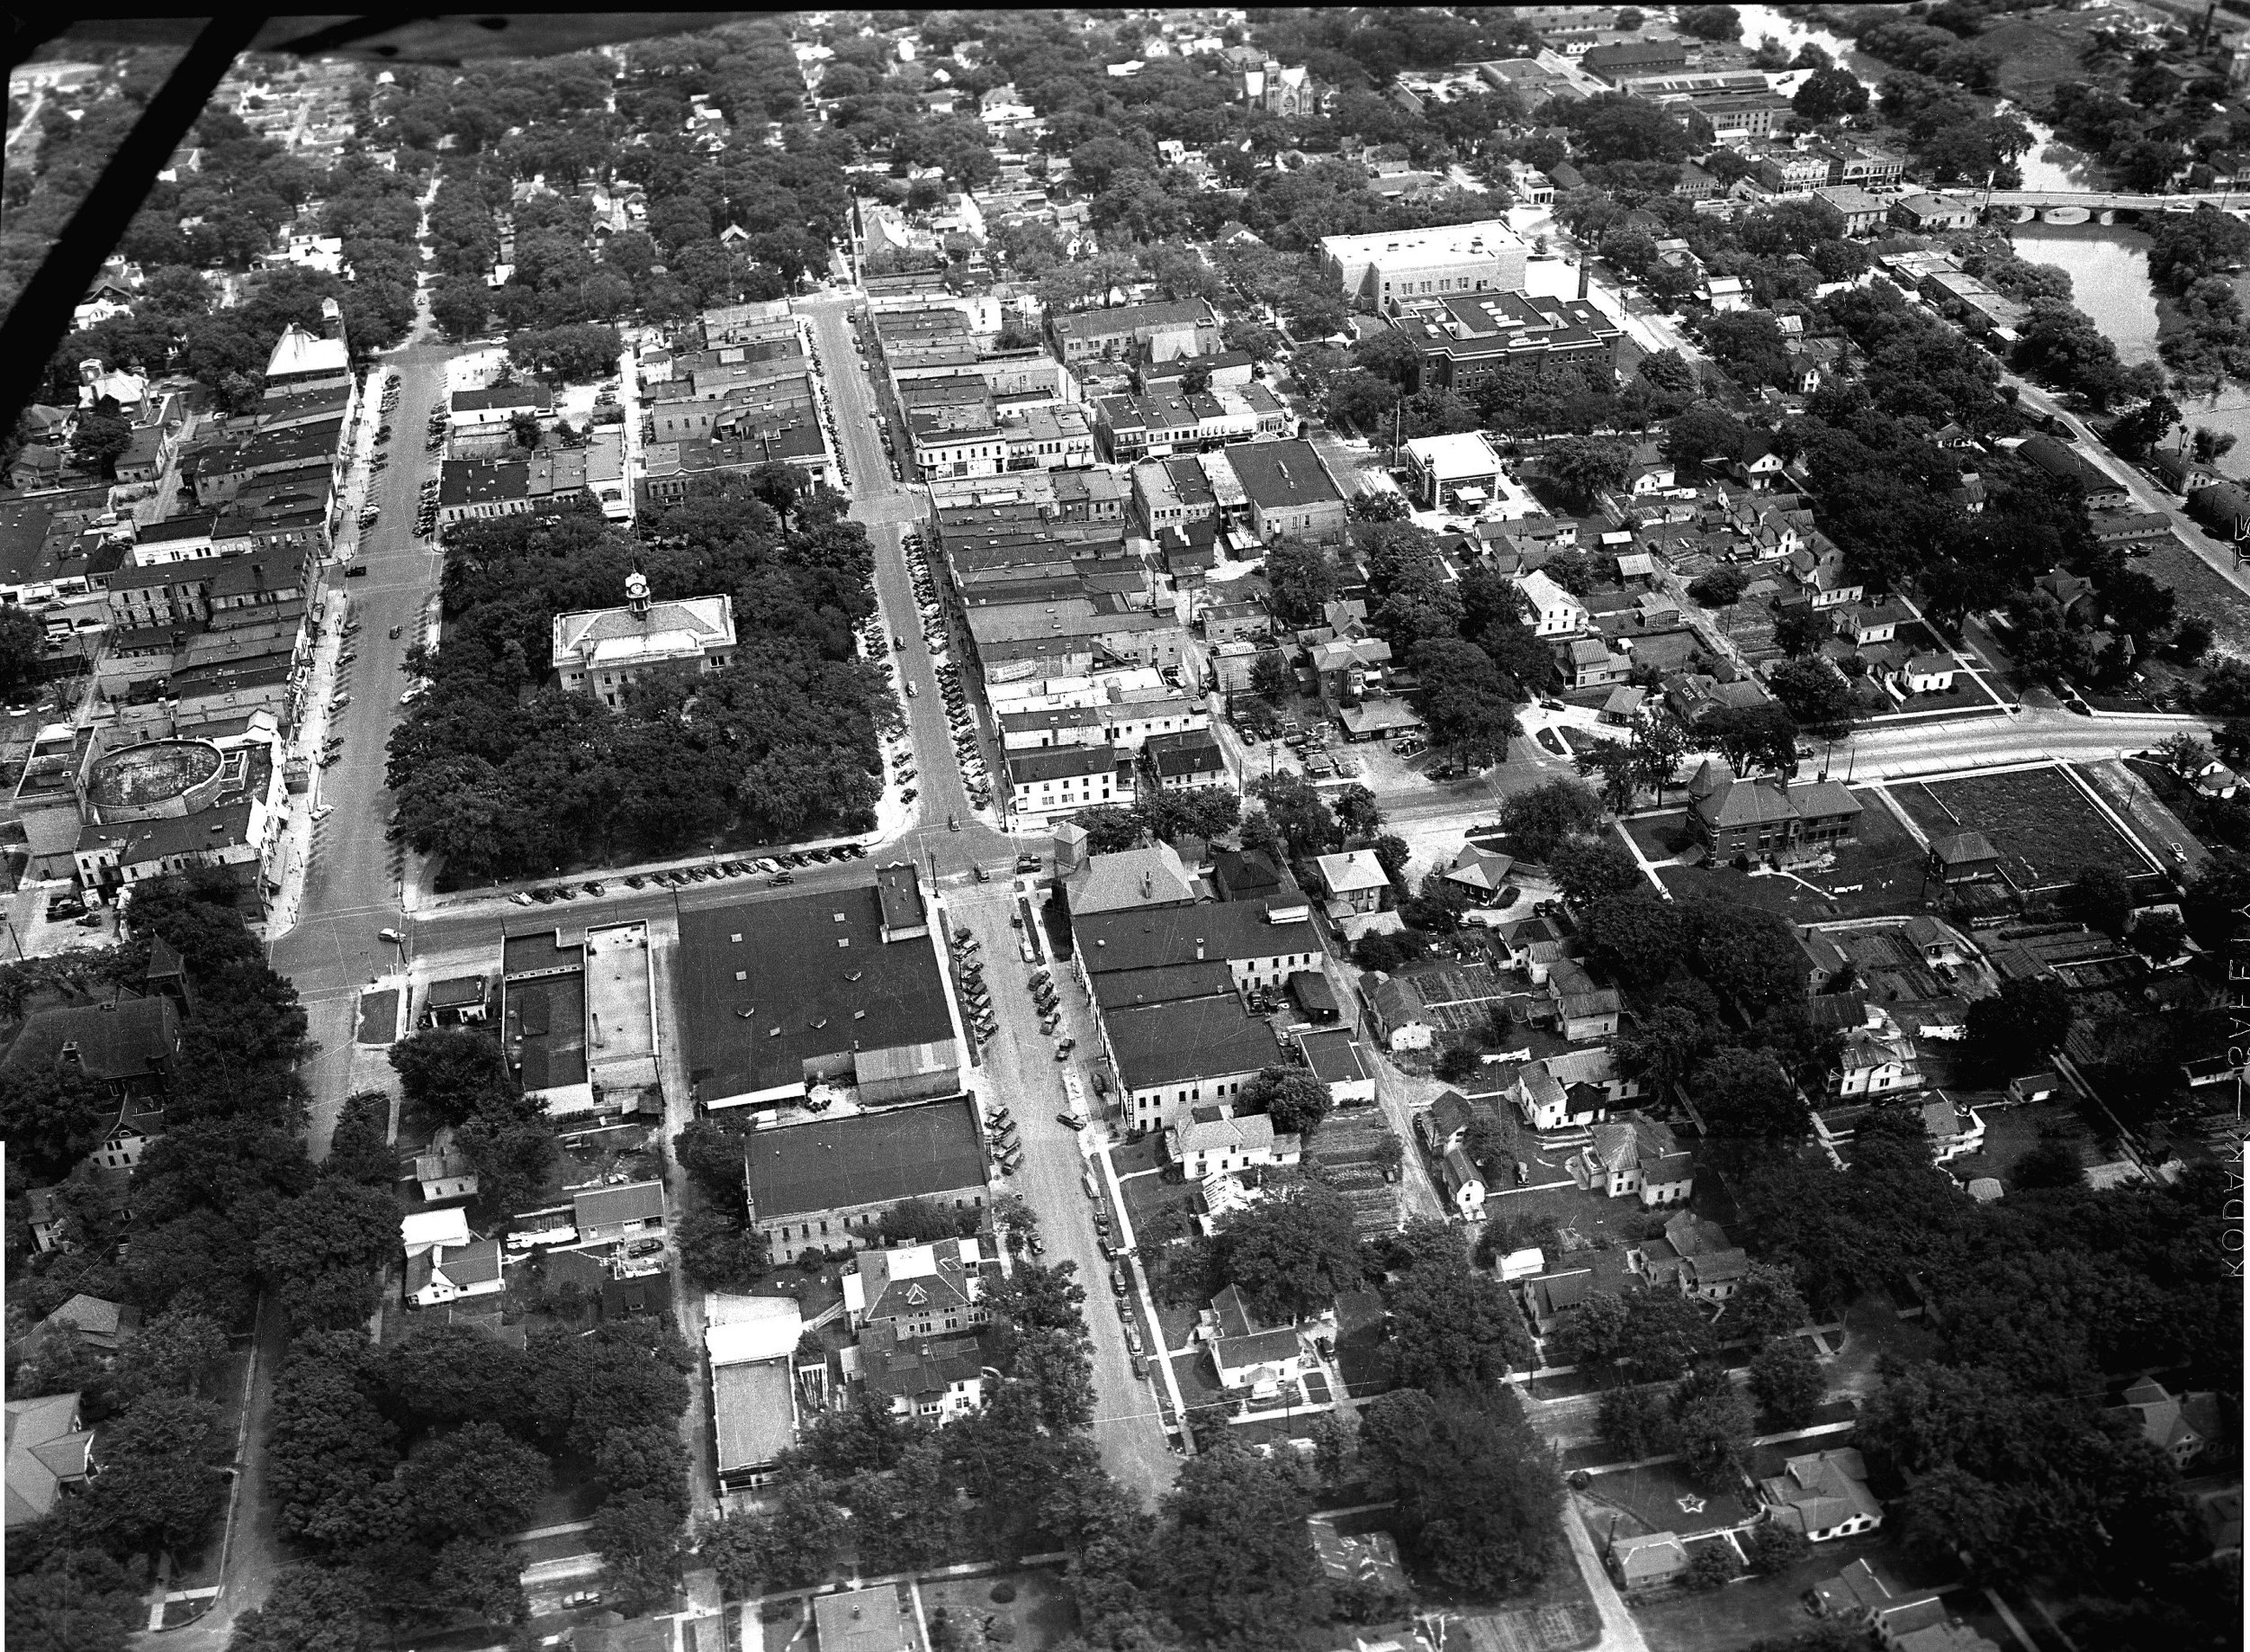 Ron Rich/SCHS Photo ca. 1945 - Courthouse, left